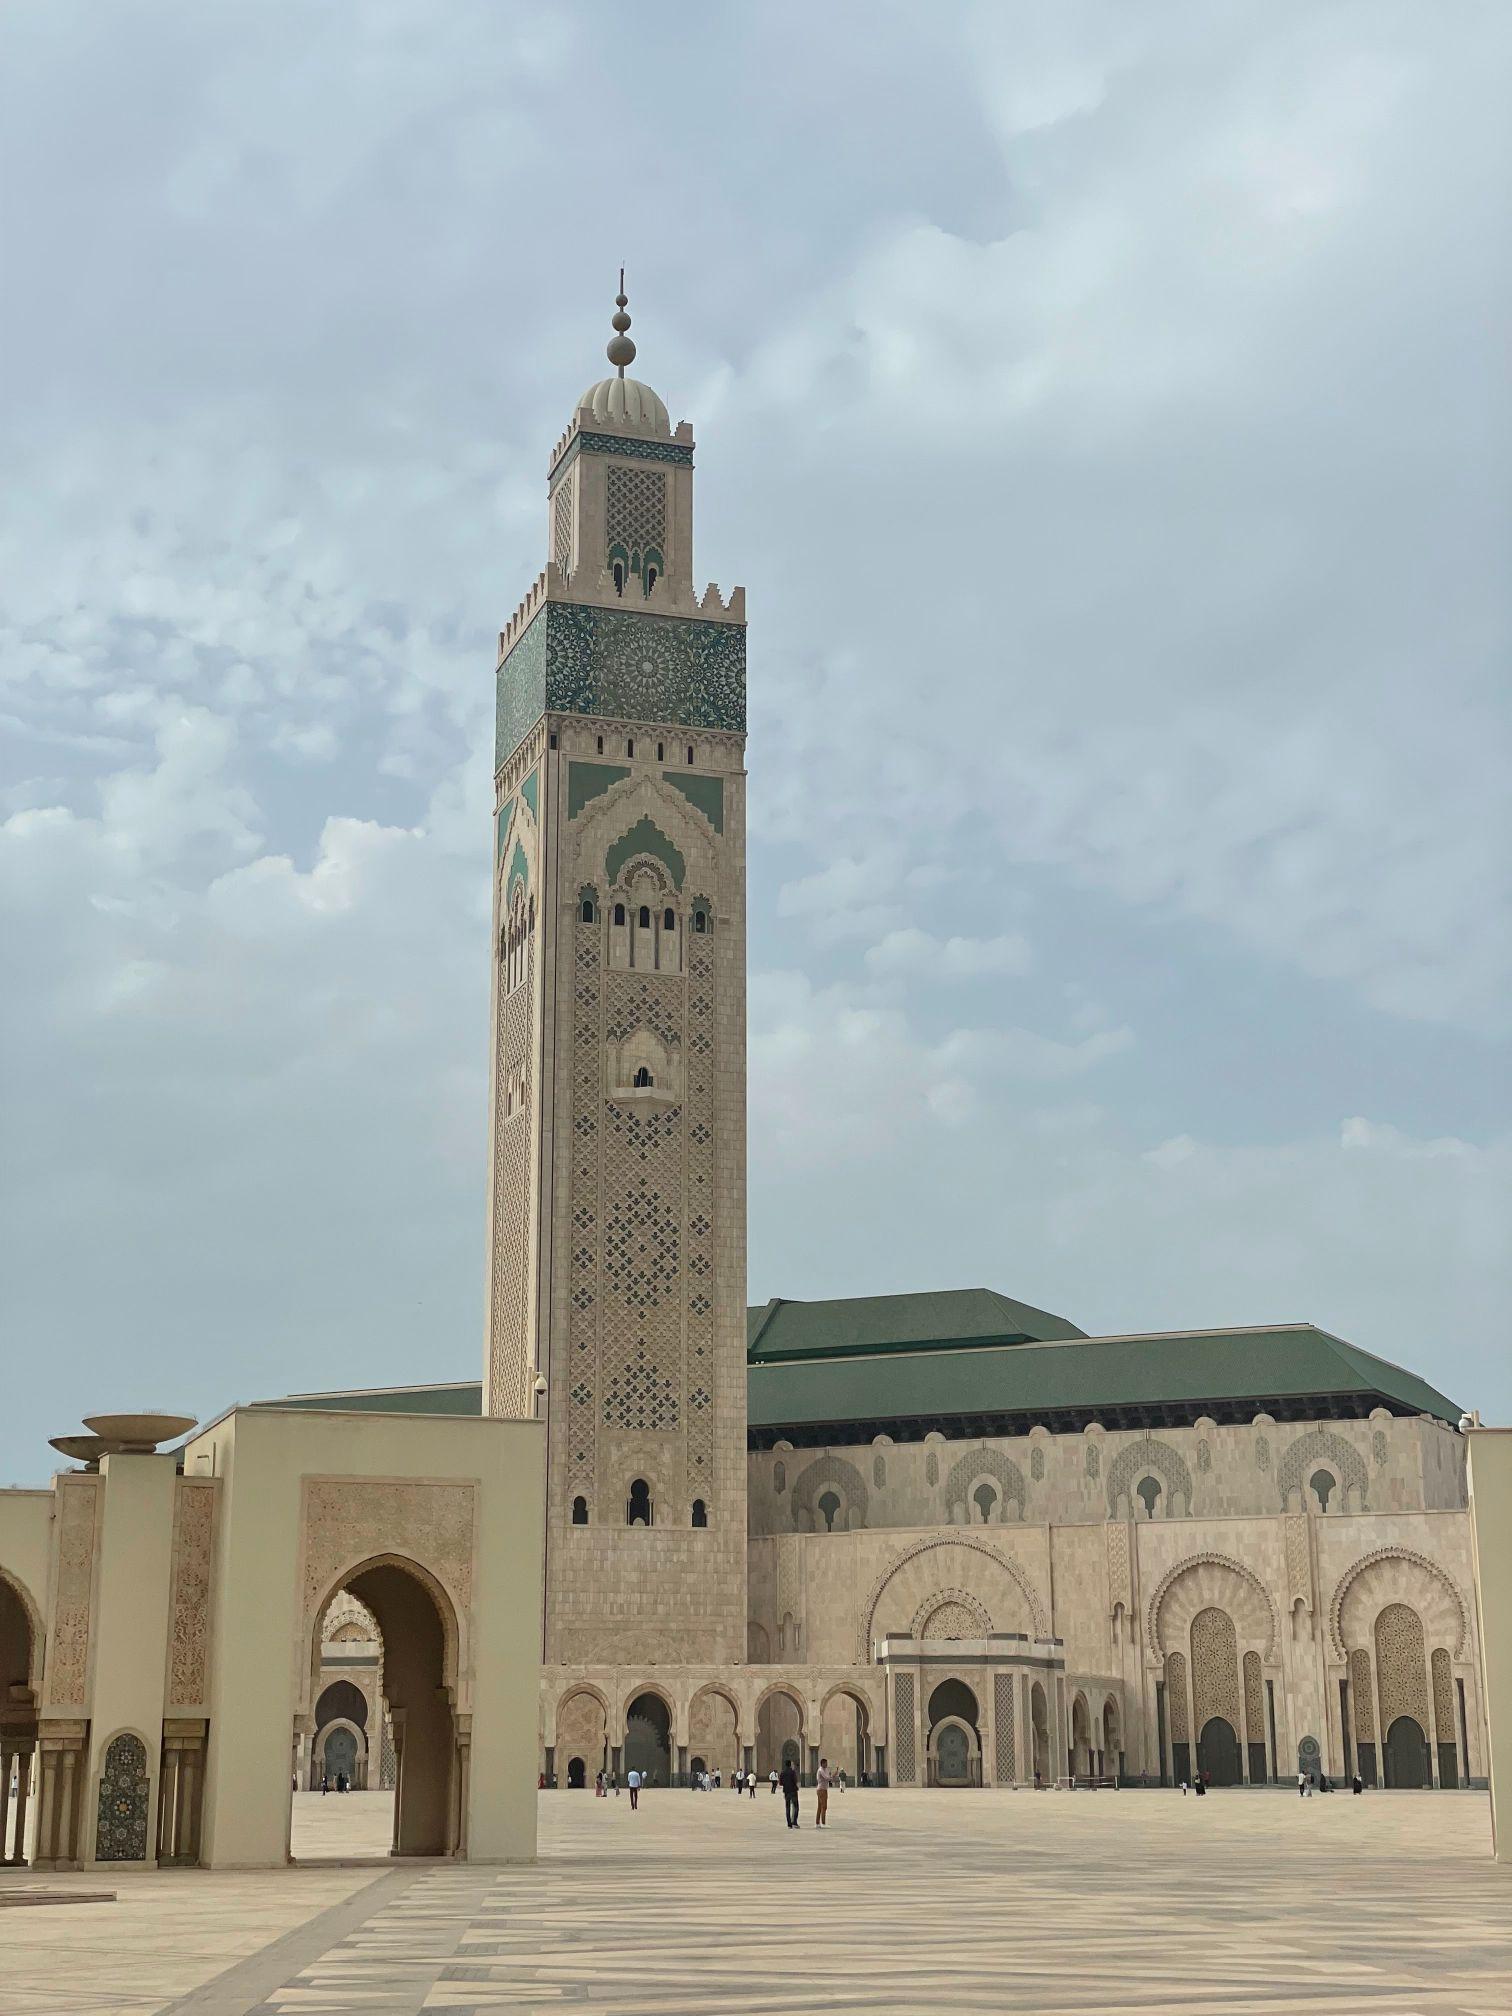 mosque hassan 2 casablanca morocco